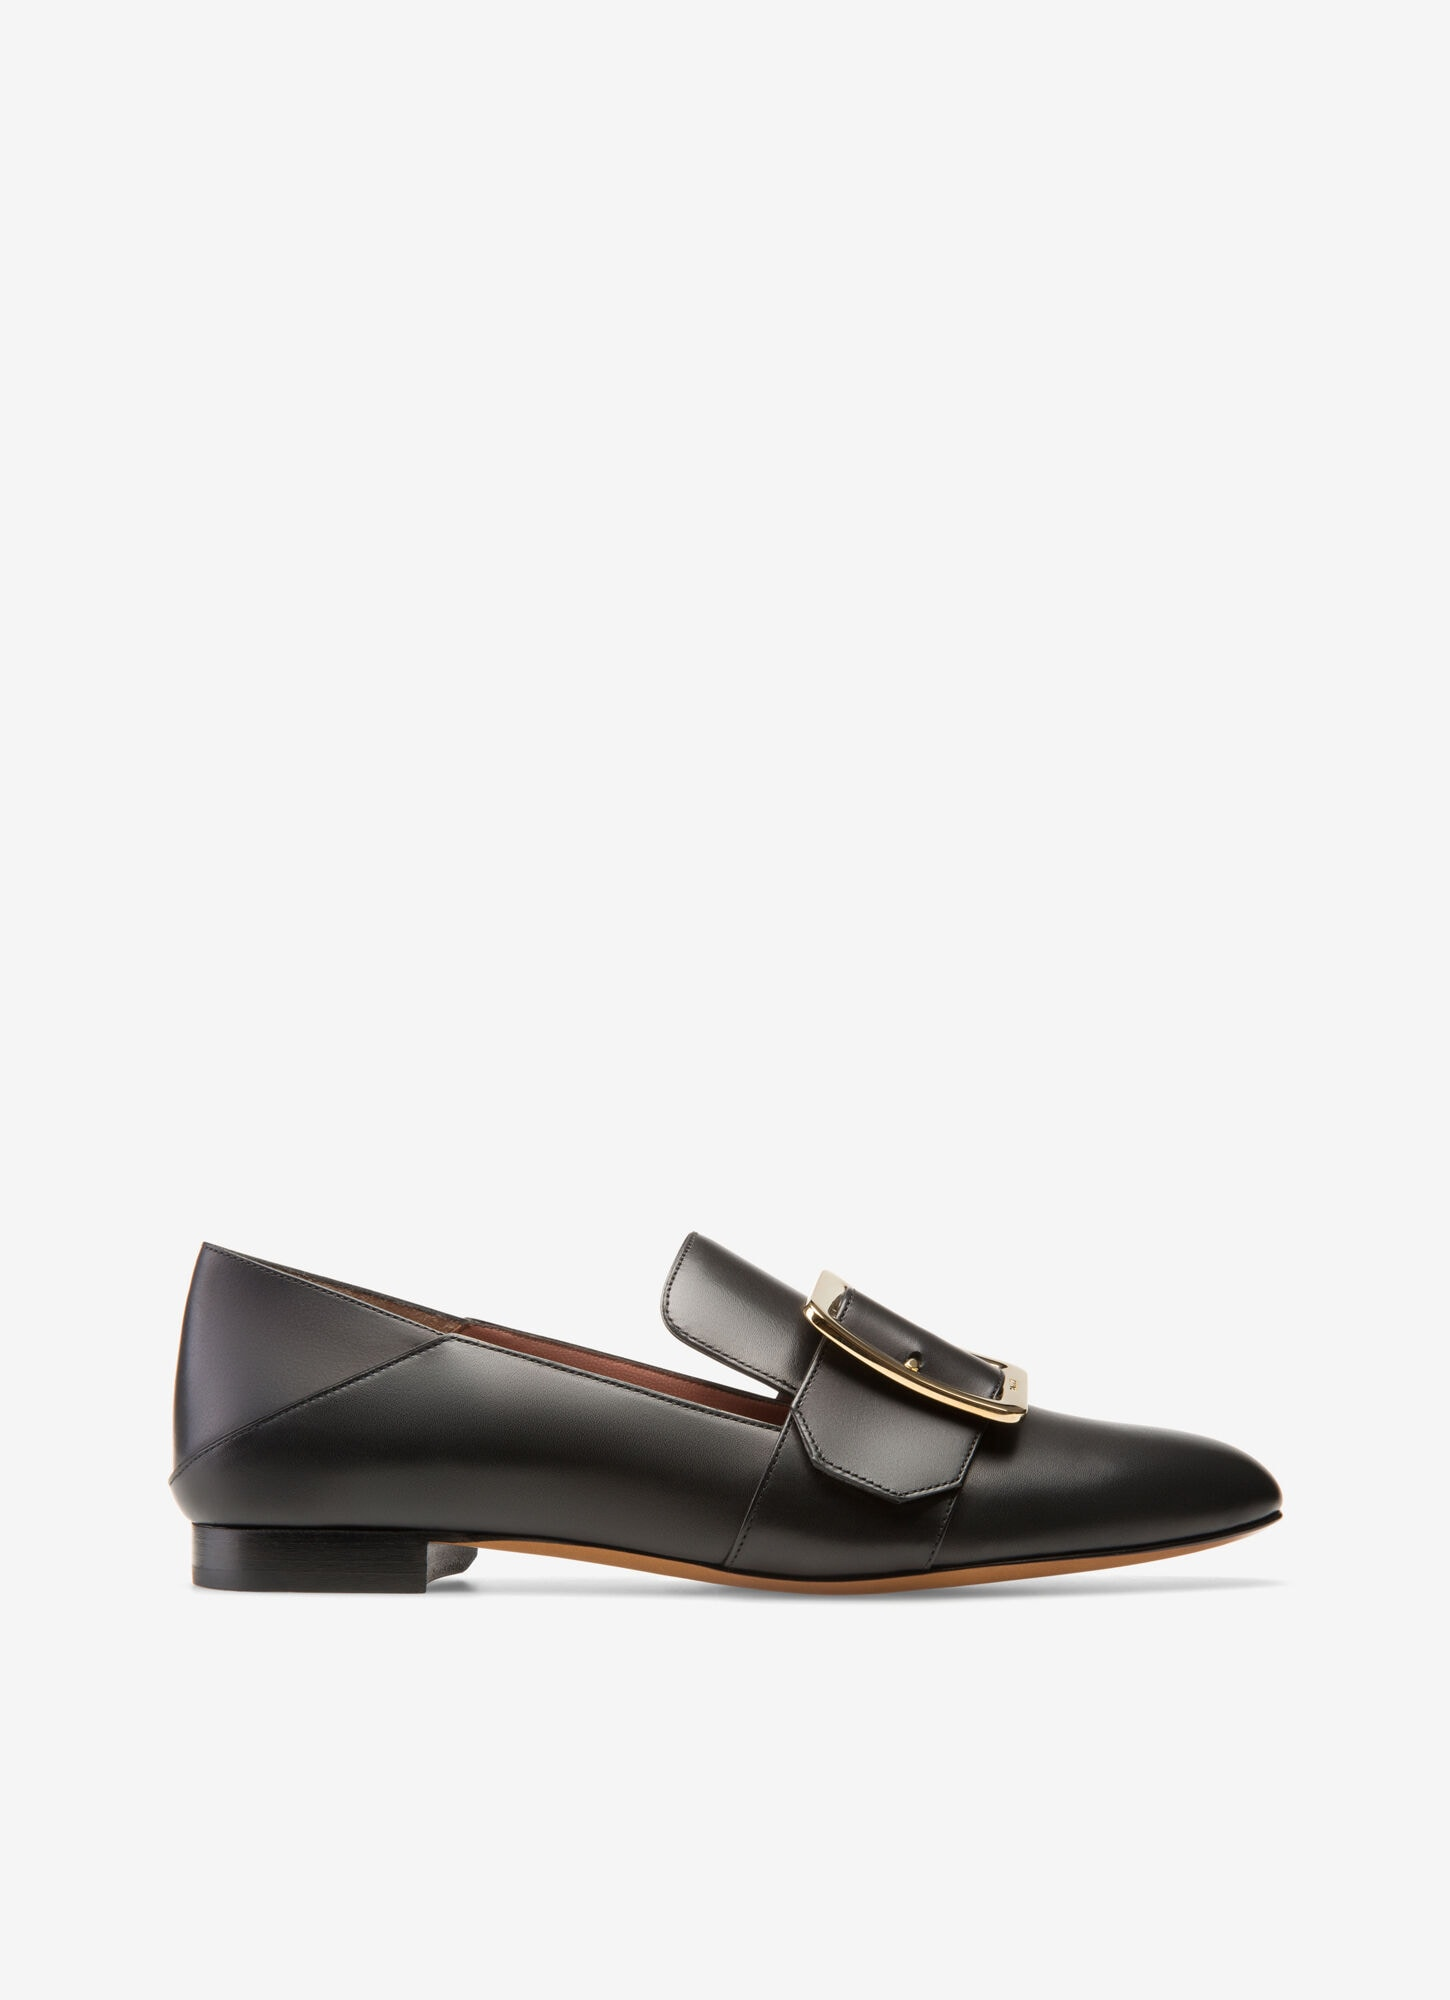 bally designer shoes